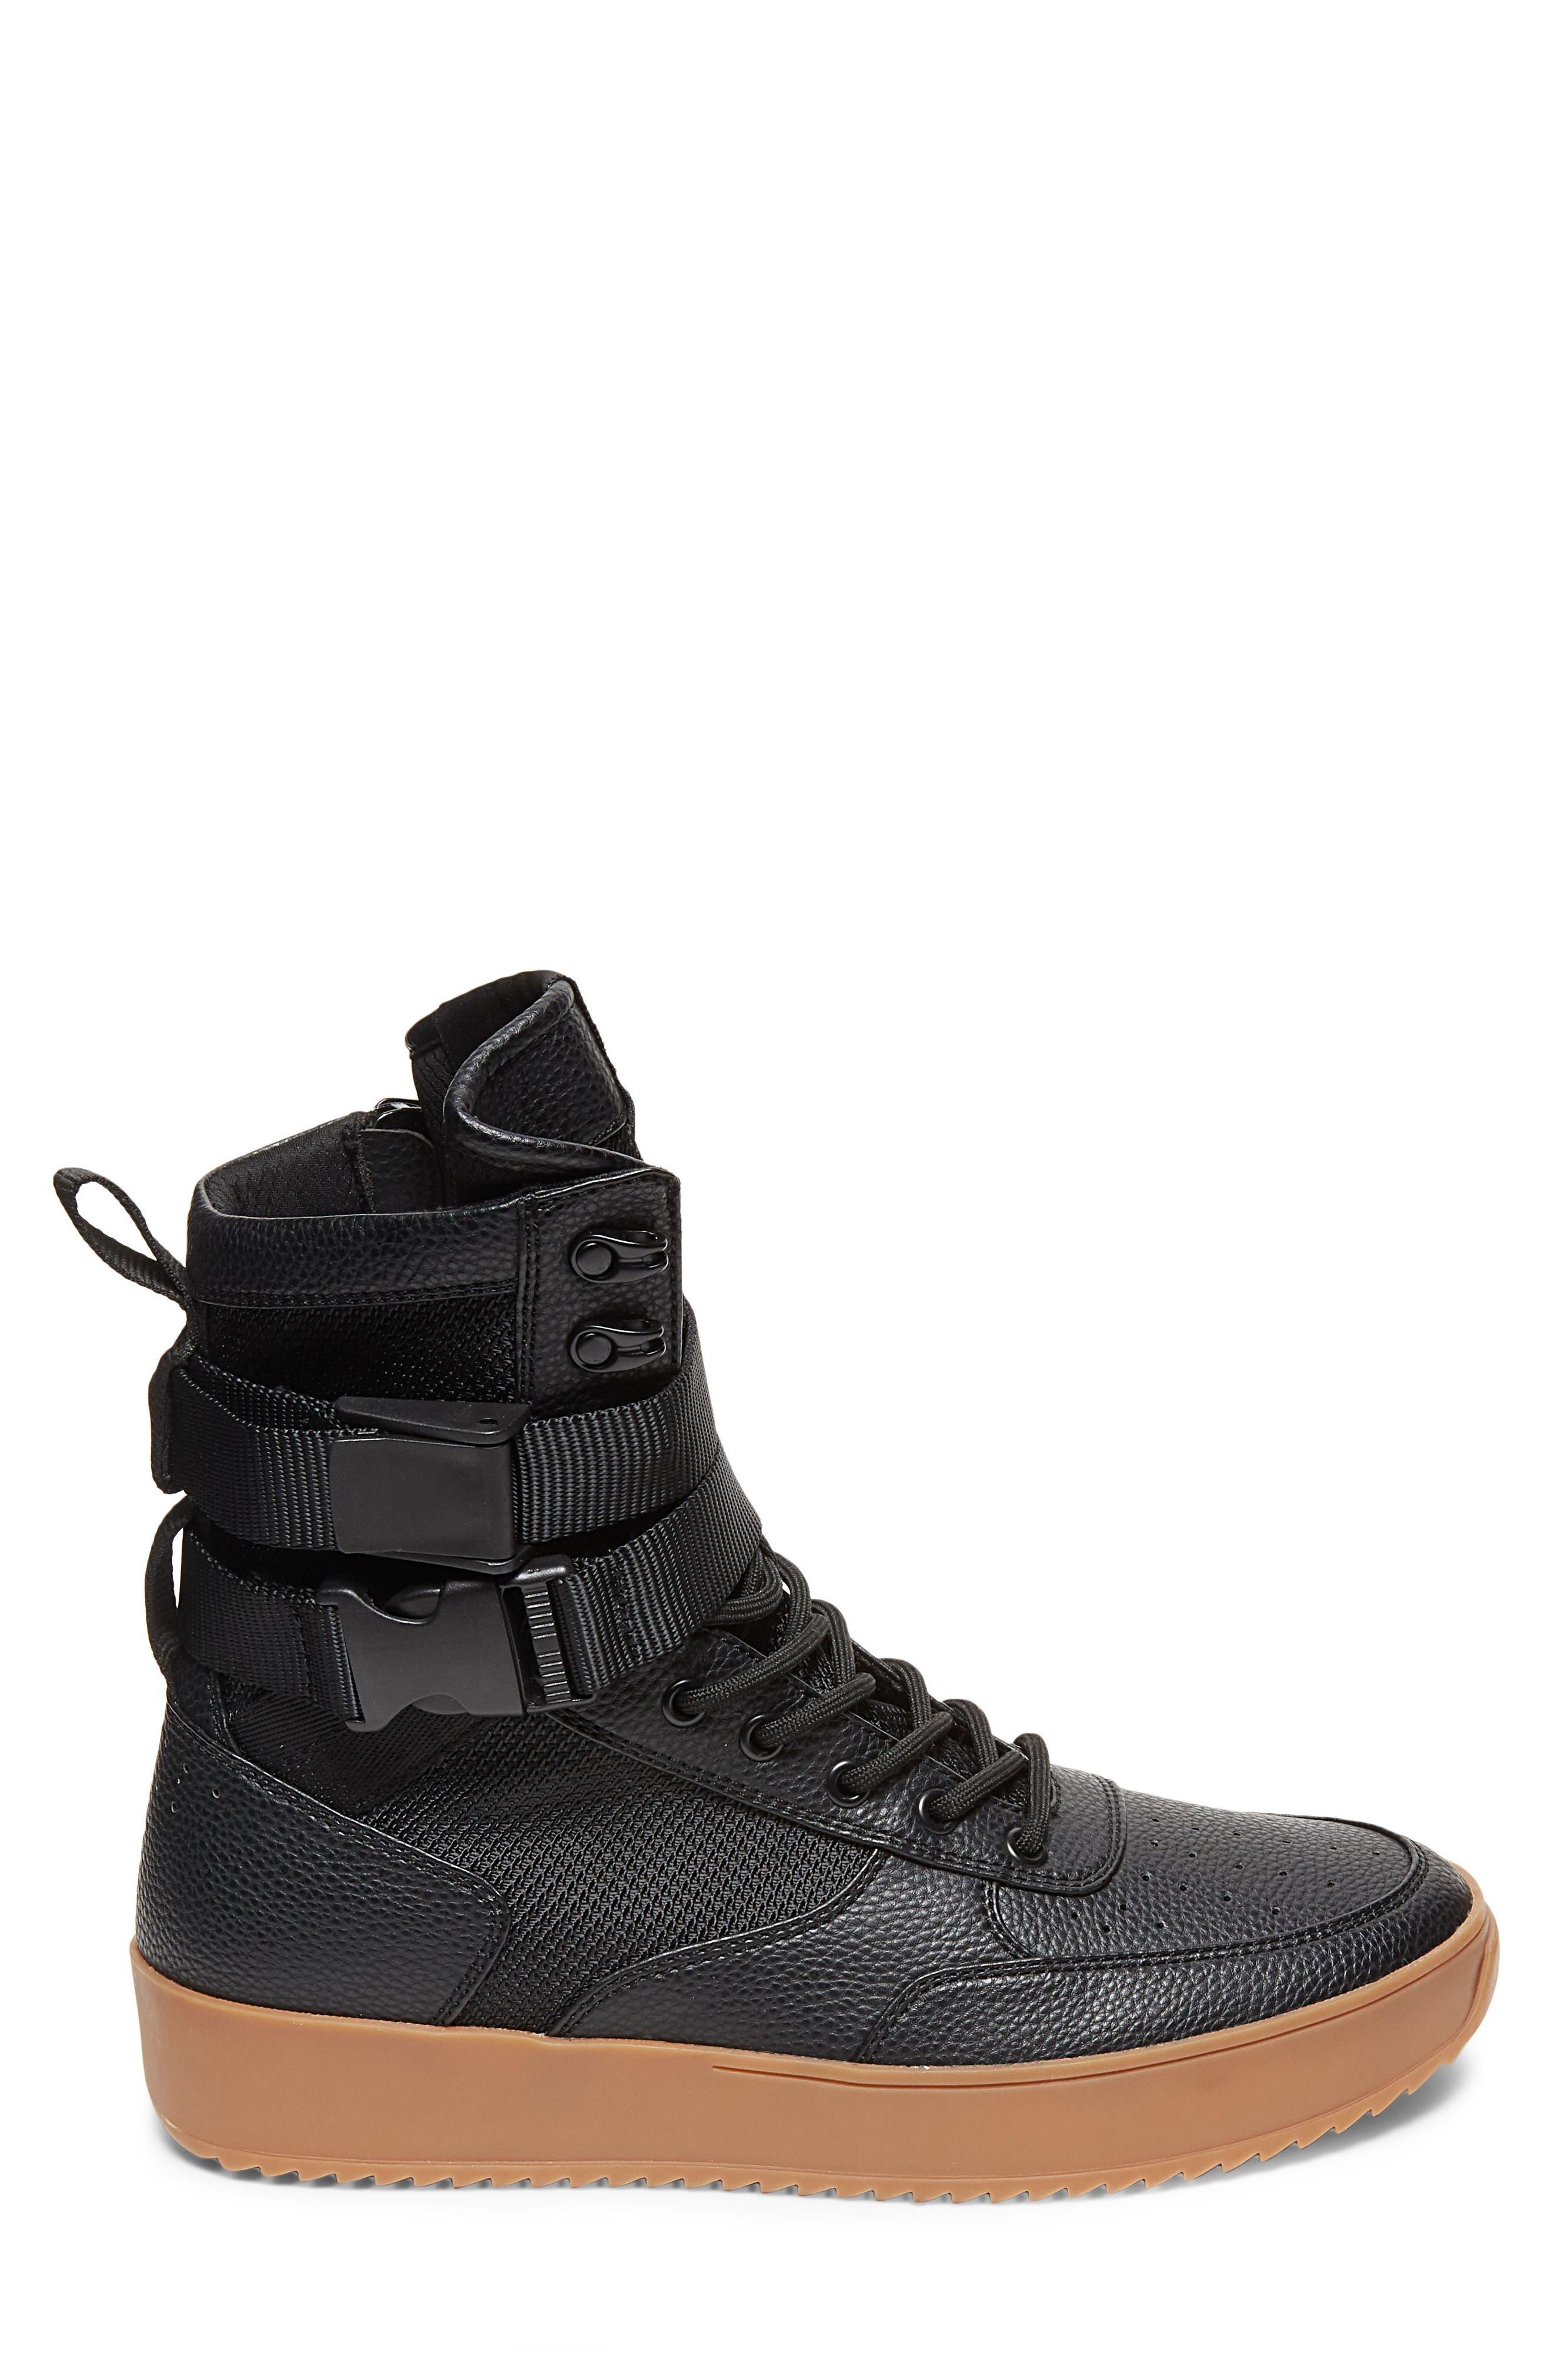 Zeroday Sneaker,                             Alternate thumbnail 7, color,